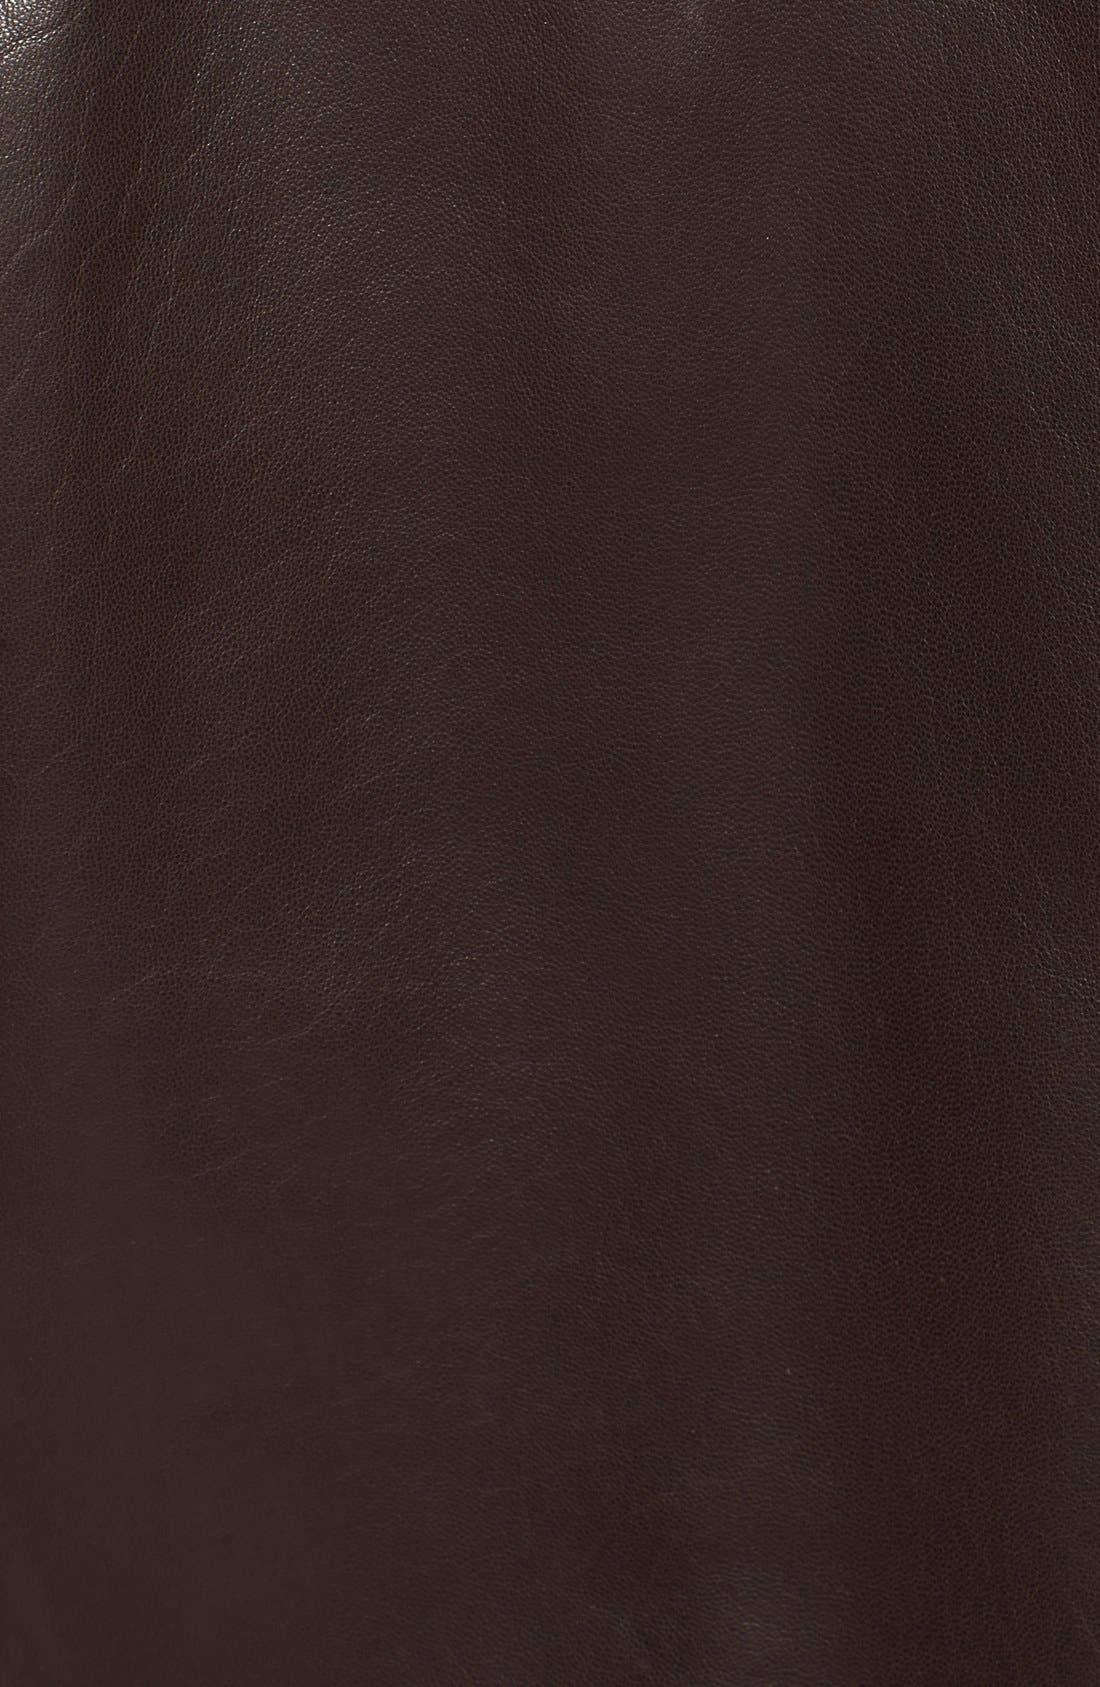 Lambskin Leather Jacket,                             Alternate thumbnail 3, color,                             Java